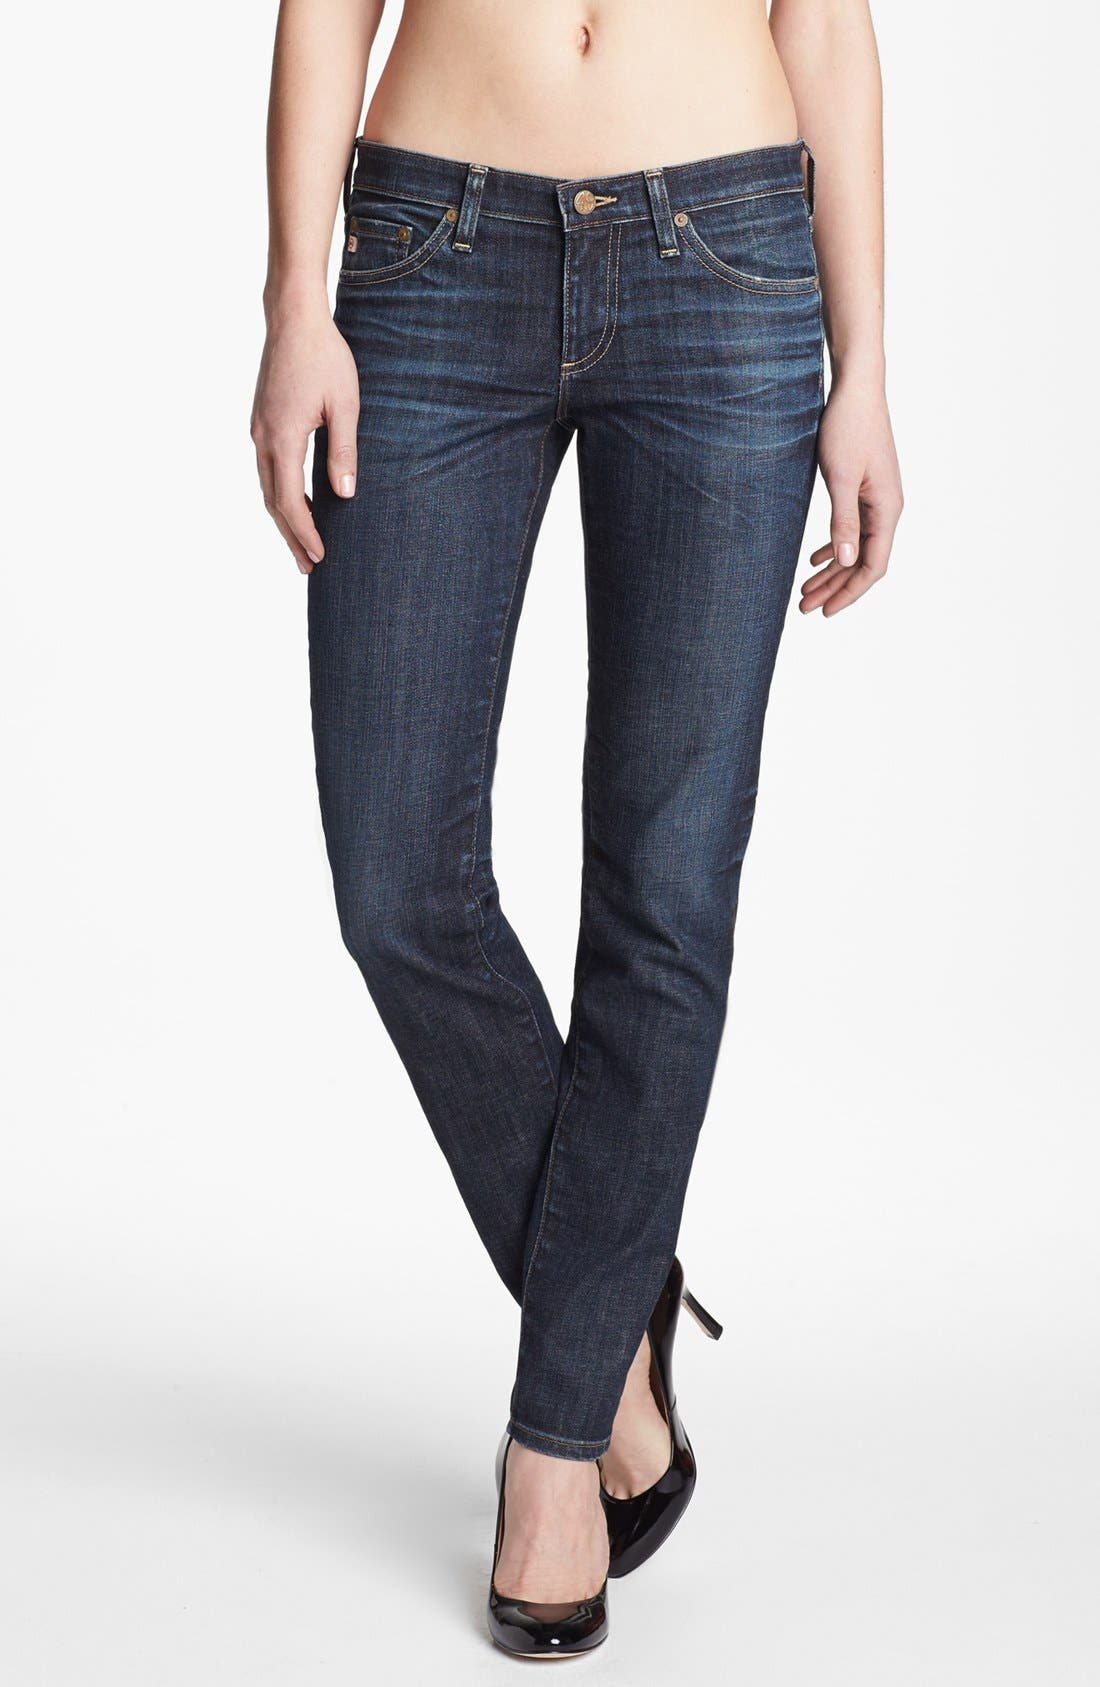 Alternate Image 1 Selected - AG 'The Stilt' Cigarette Leg Stretch Jeans (4 Year Coastline)